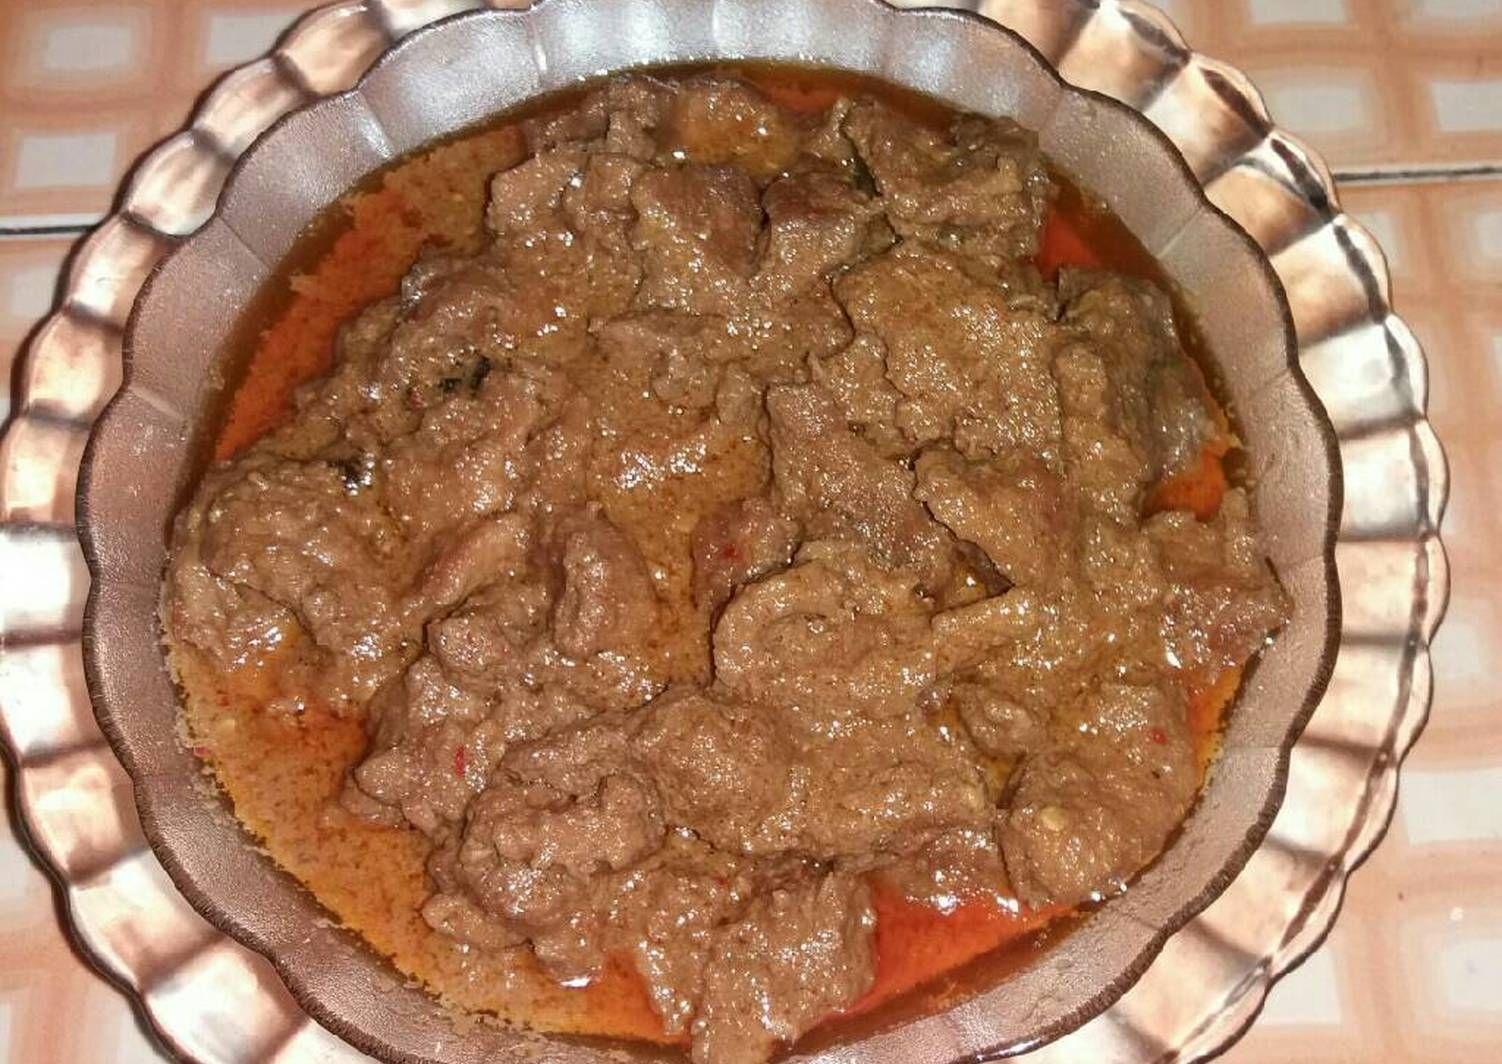 Resep Semur Santan Daging Kitaberbagi Oleh Ria Khairiyah Resep Makanan Daging Has Dalam Resep